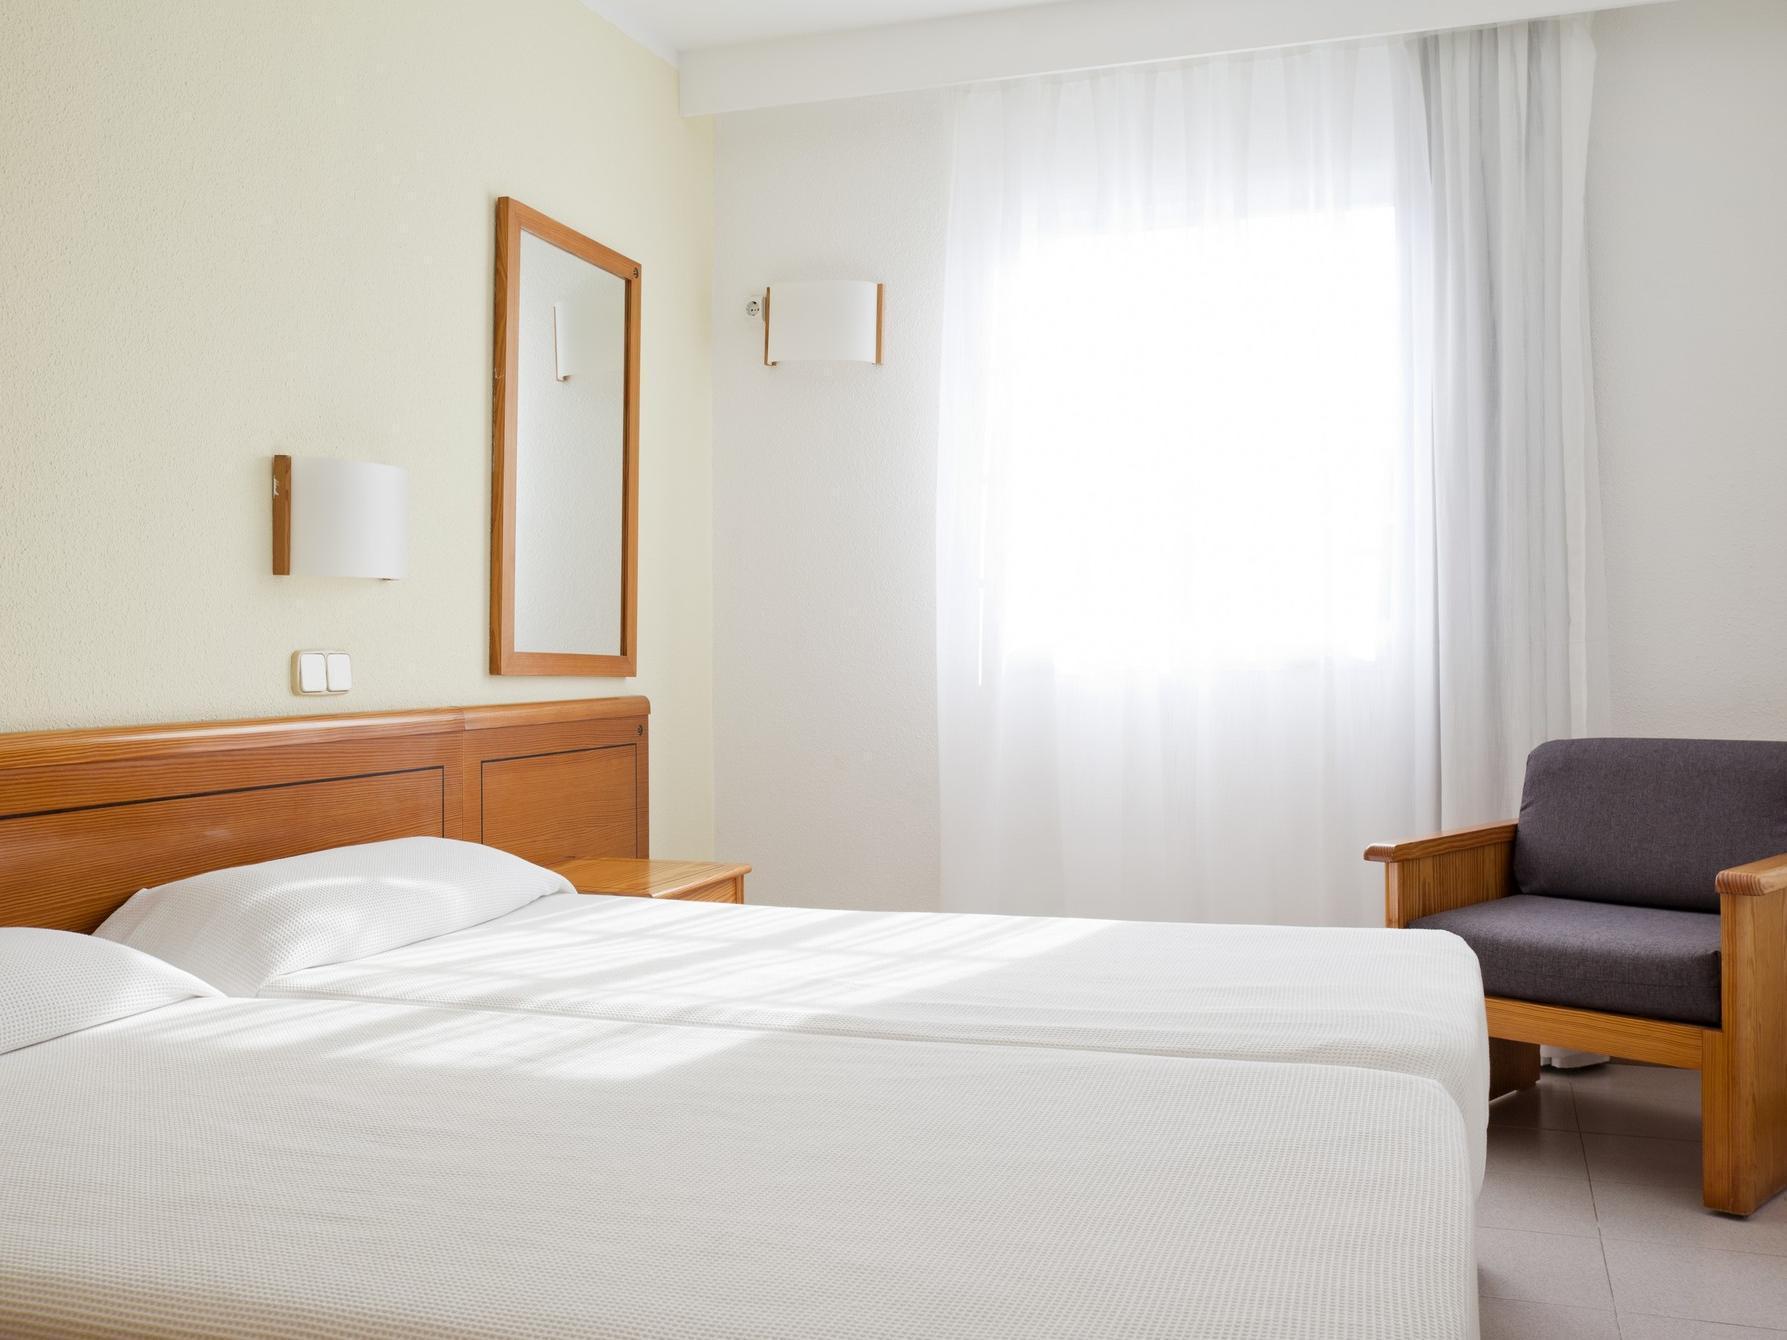 Ilunion Menorca Hotel, Baleares